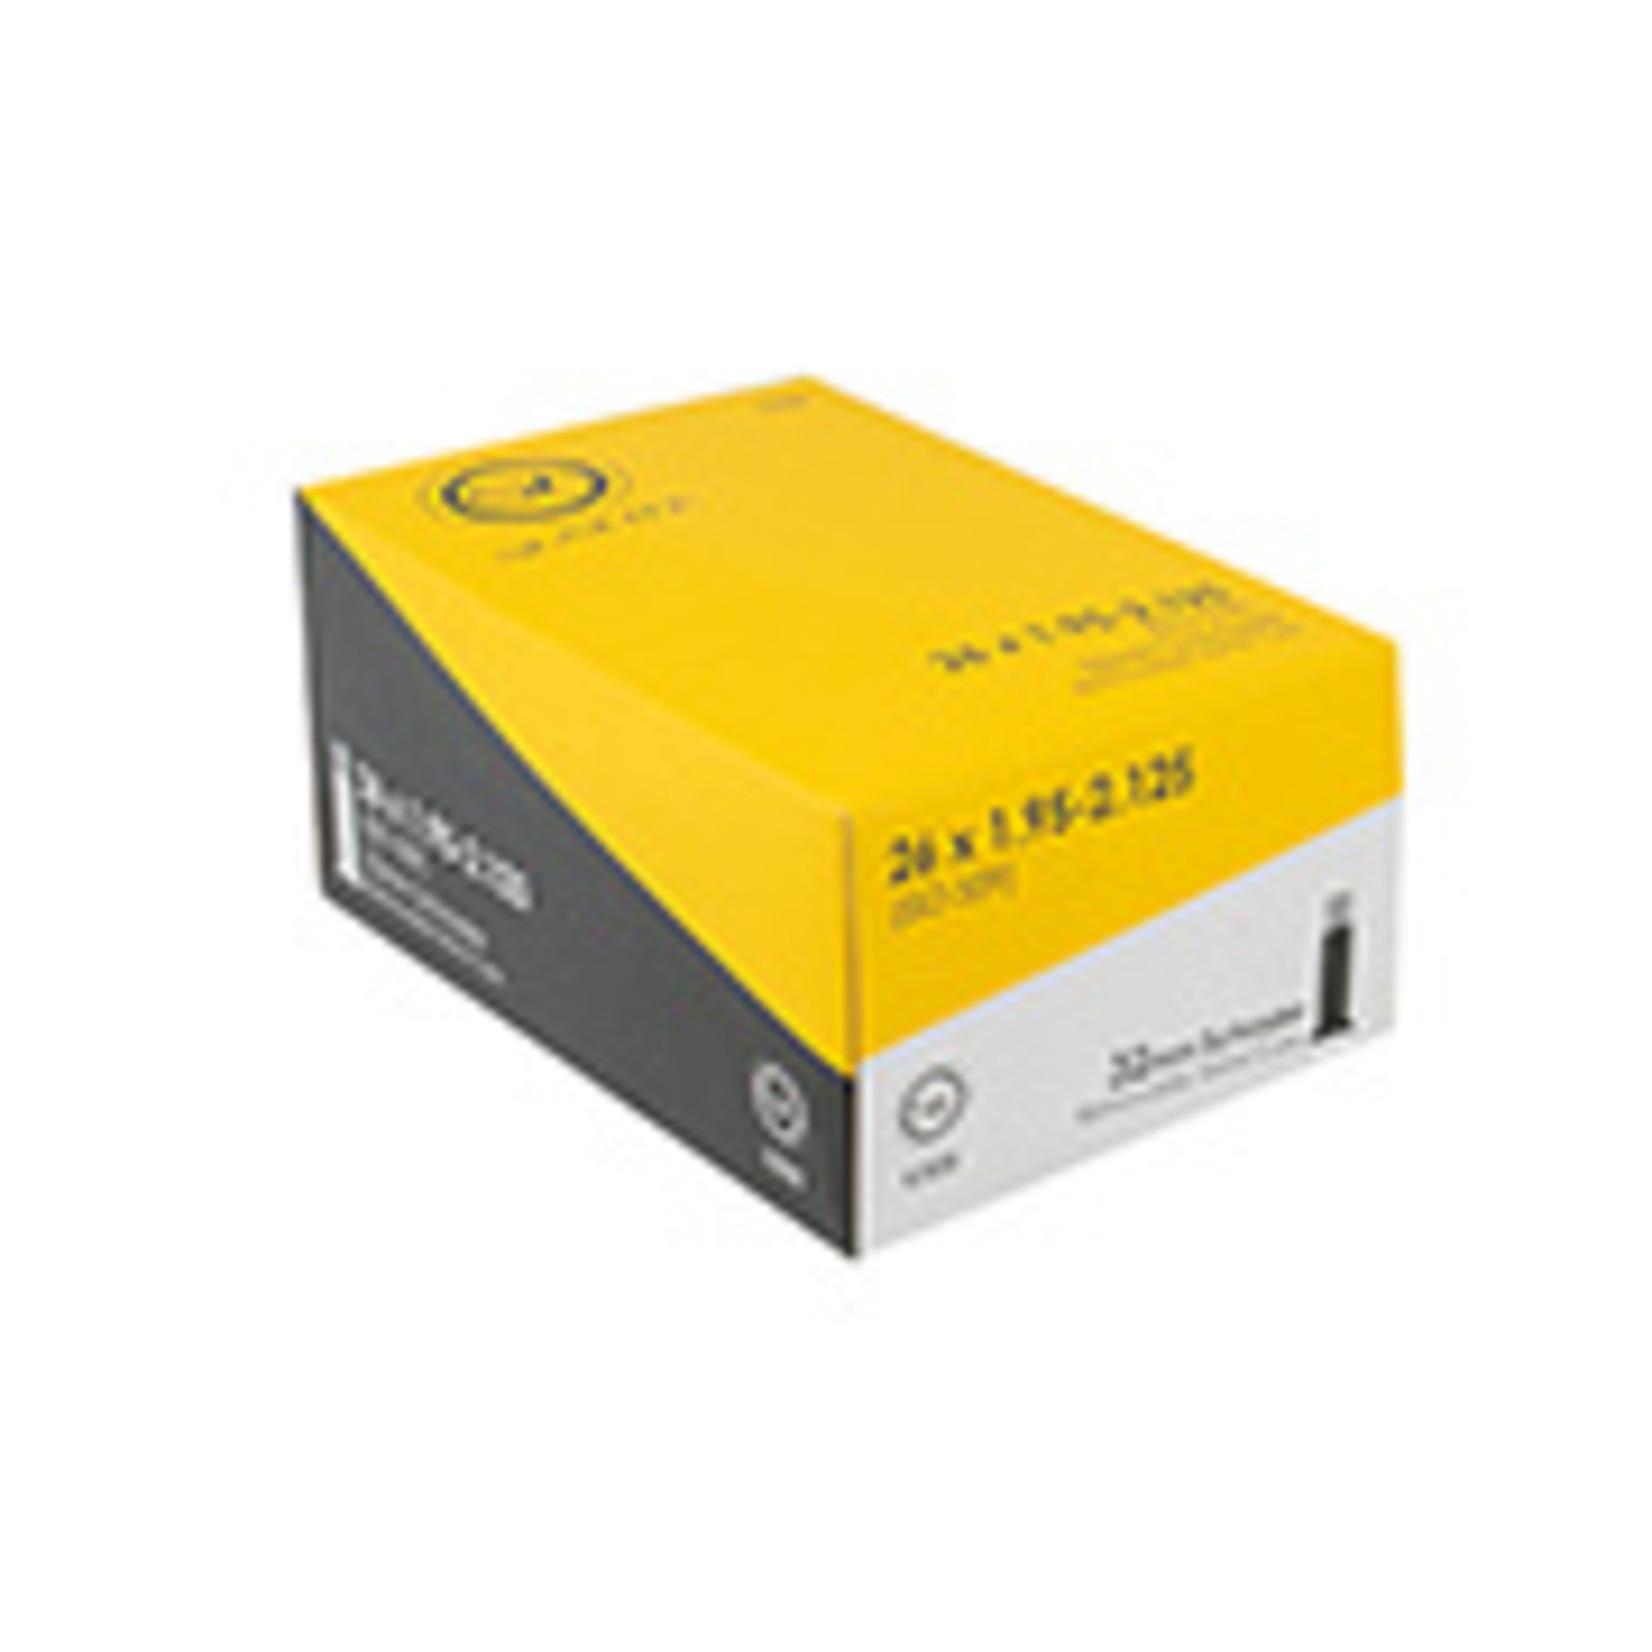 TUBES SUNLT UTILIT THORN RES 26x2.00-2.40 SV35 FFW54mm